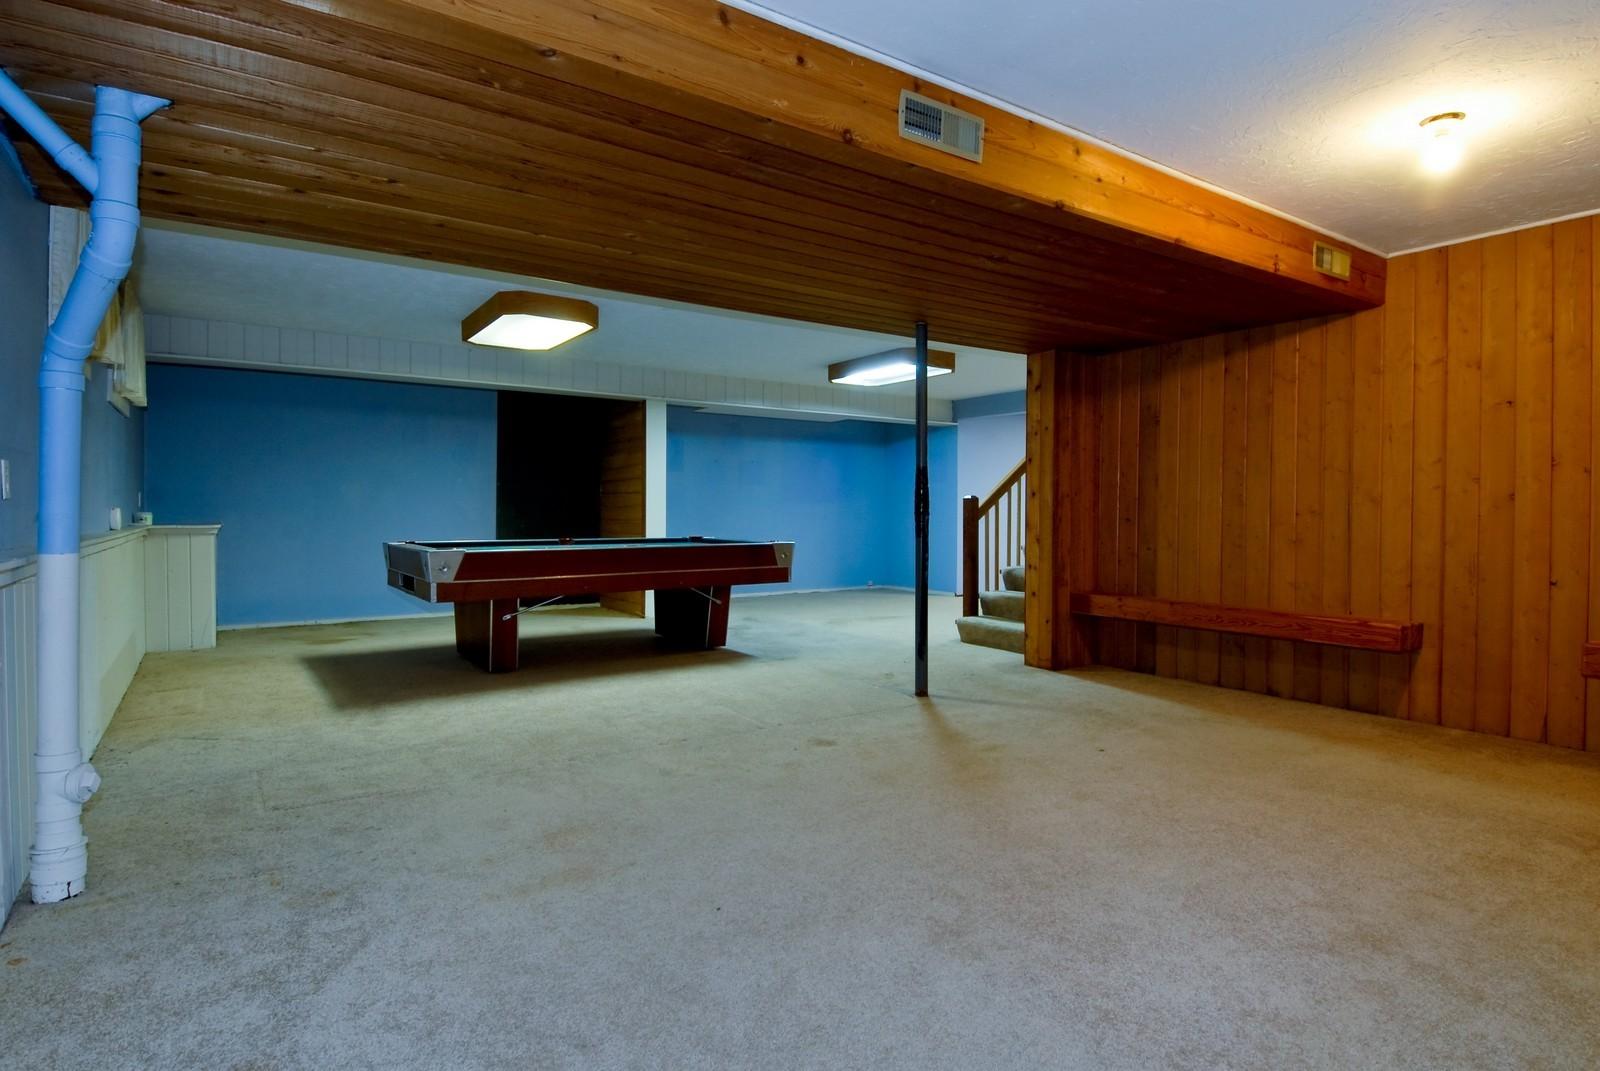 Real Estate Photography - 625 Konen Ave, Aurora, IL, 60505 - Recreational Area